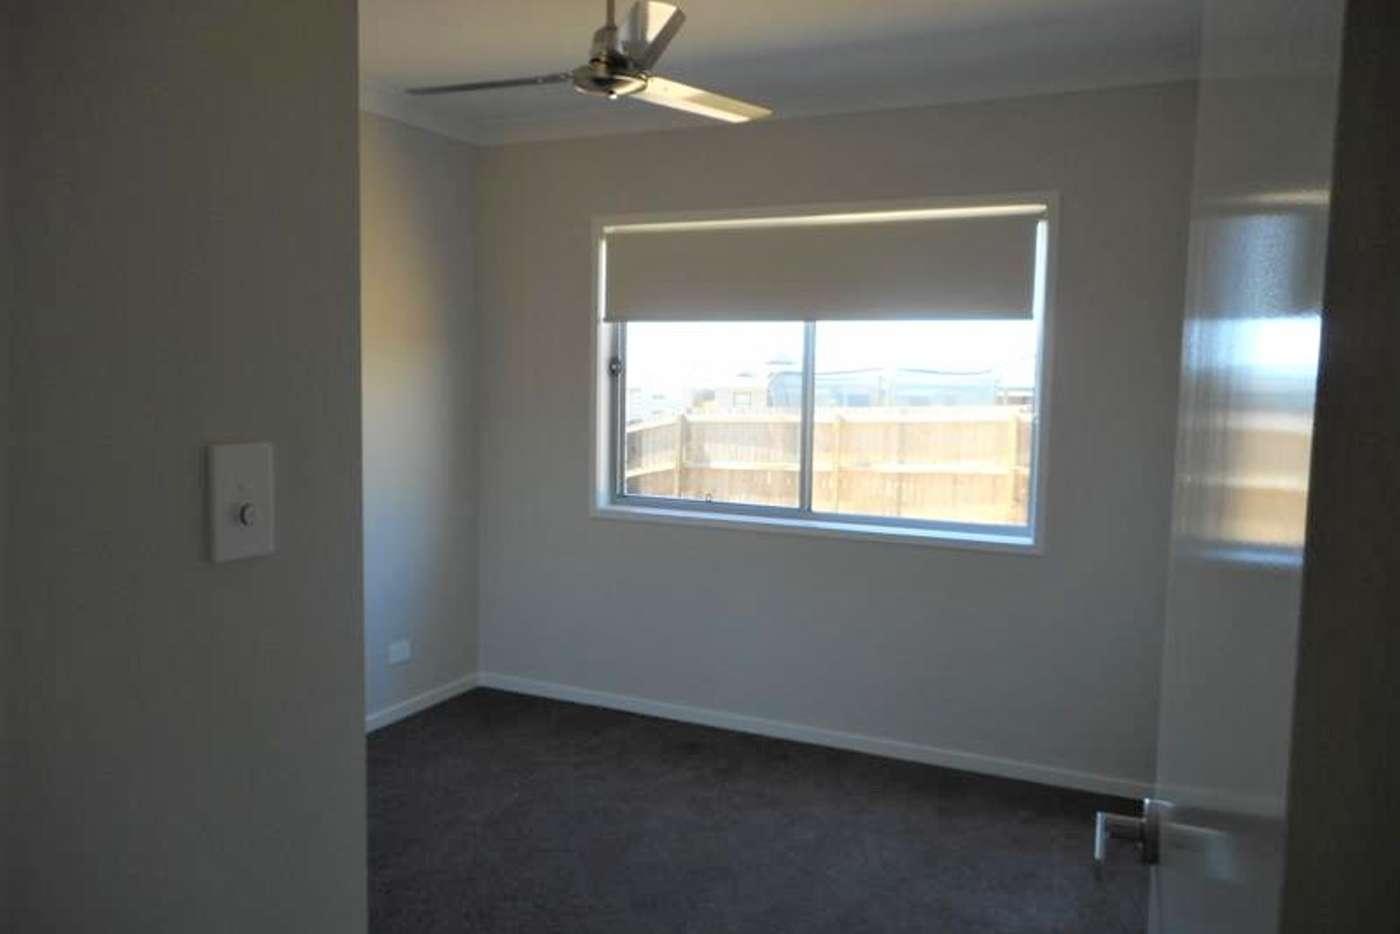 Sixth view of Homely house listing, 48 Darlington Drive, Yarrabilba QLD 4207